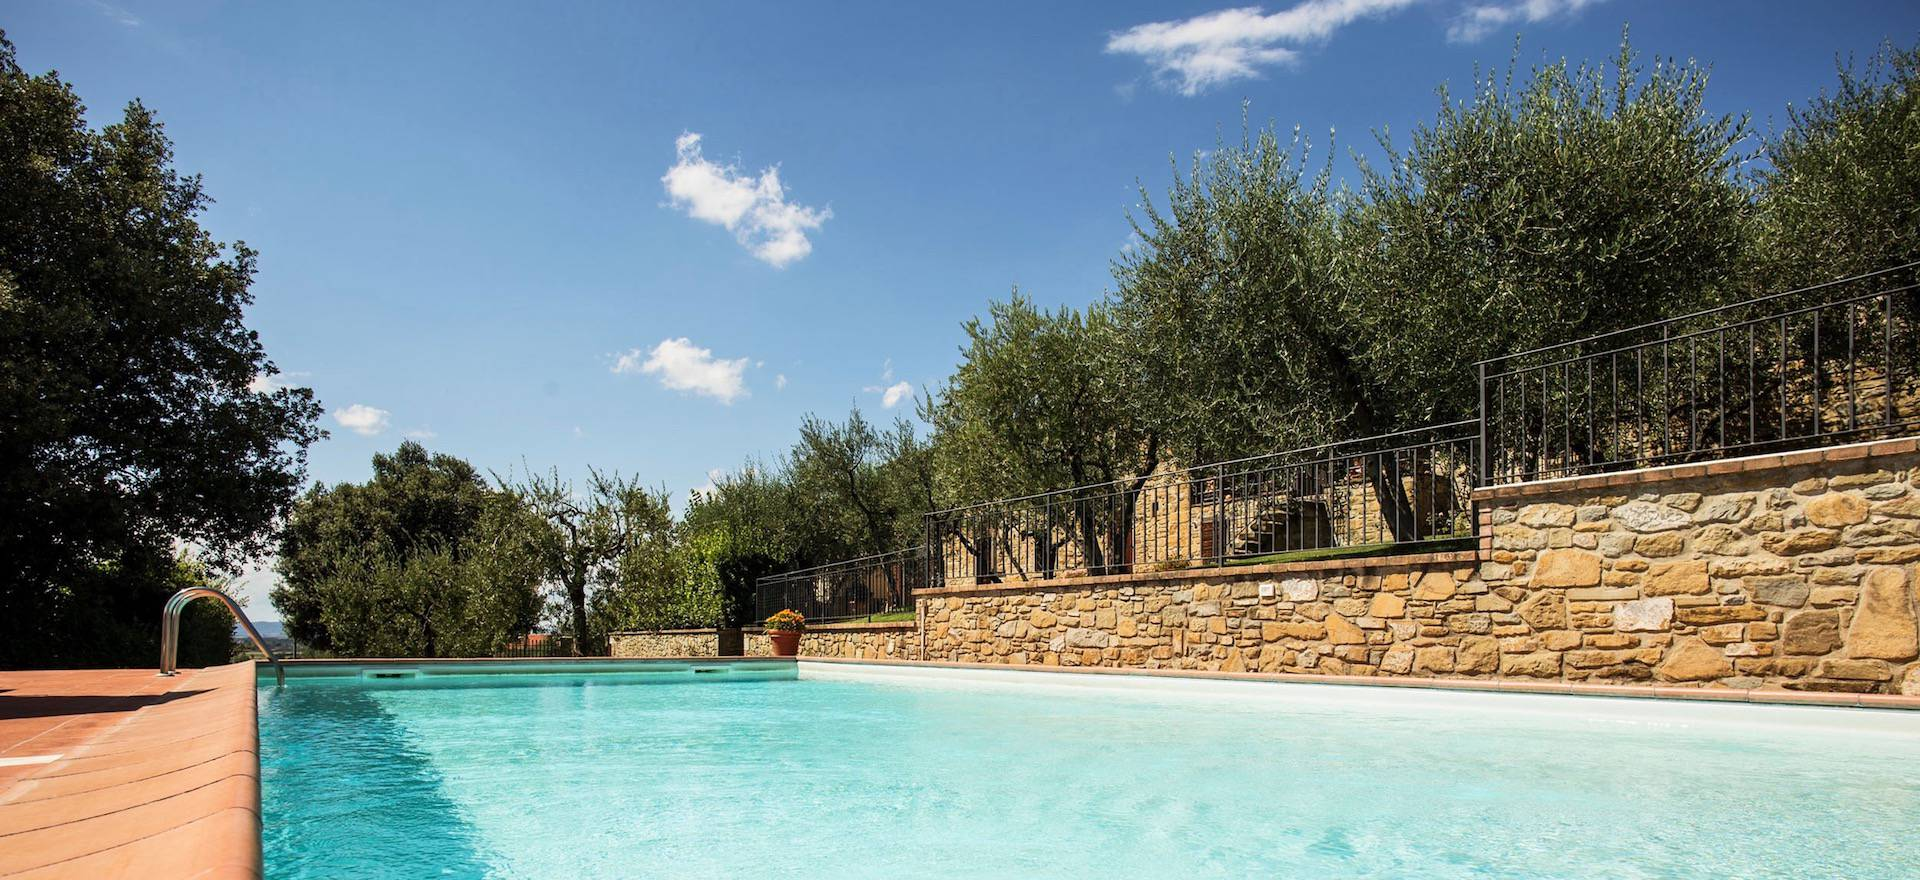 Agriturismo Toscana Accogliente agriturismo vicino a Cortona